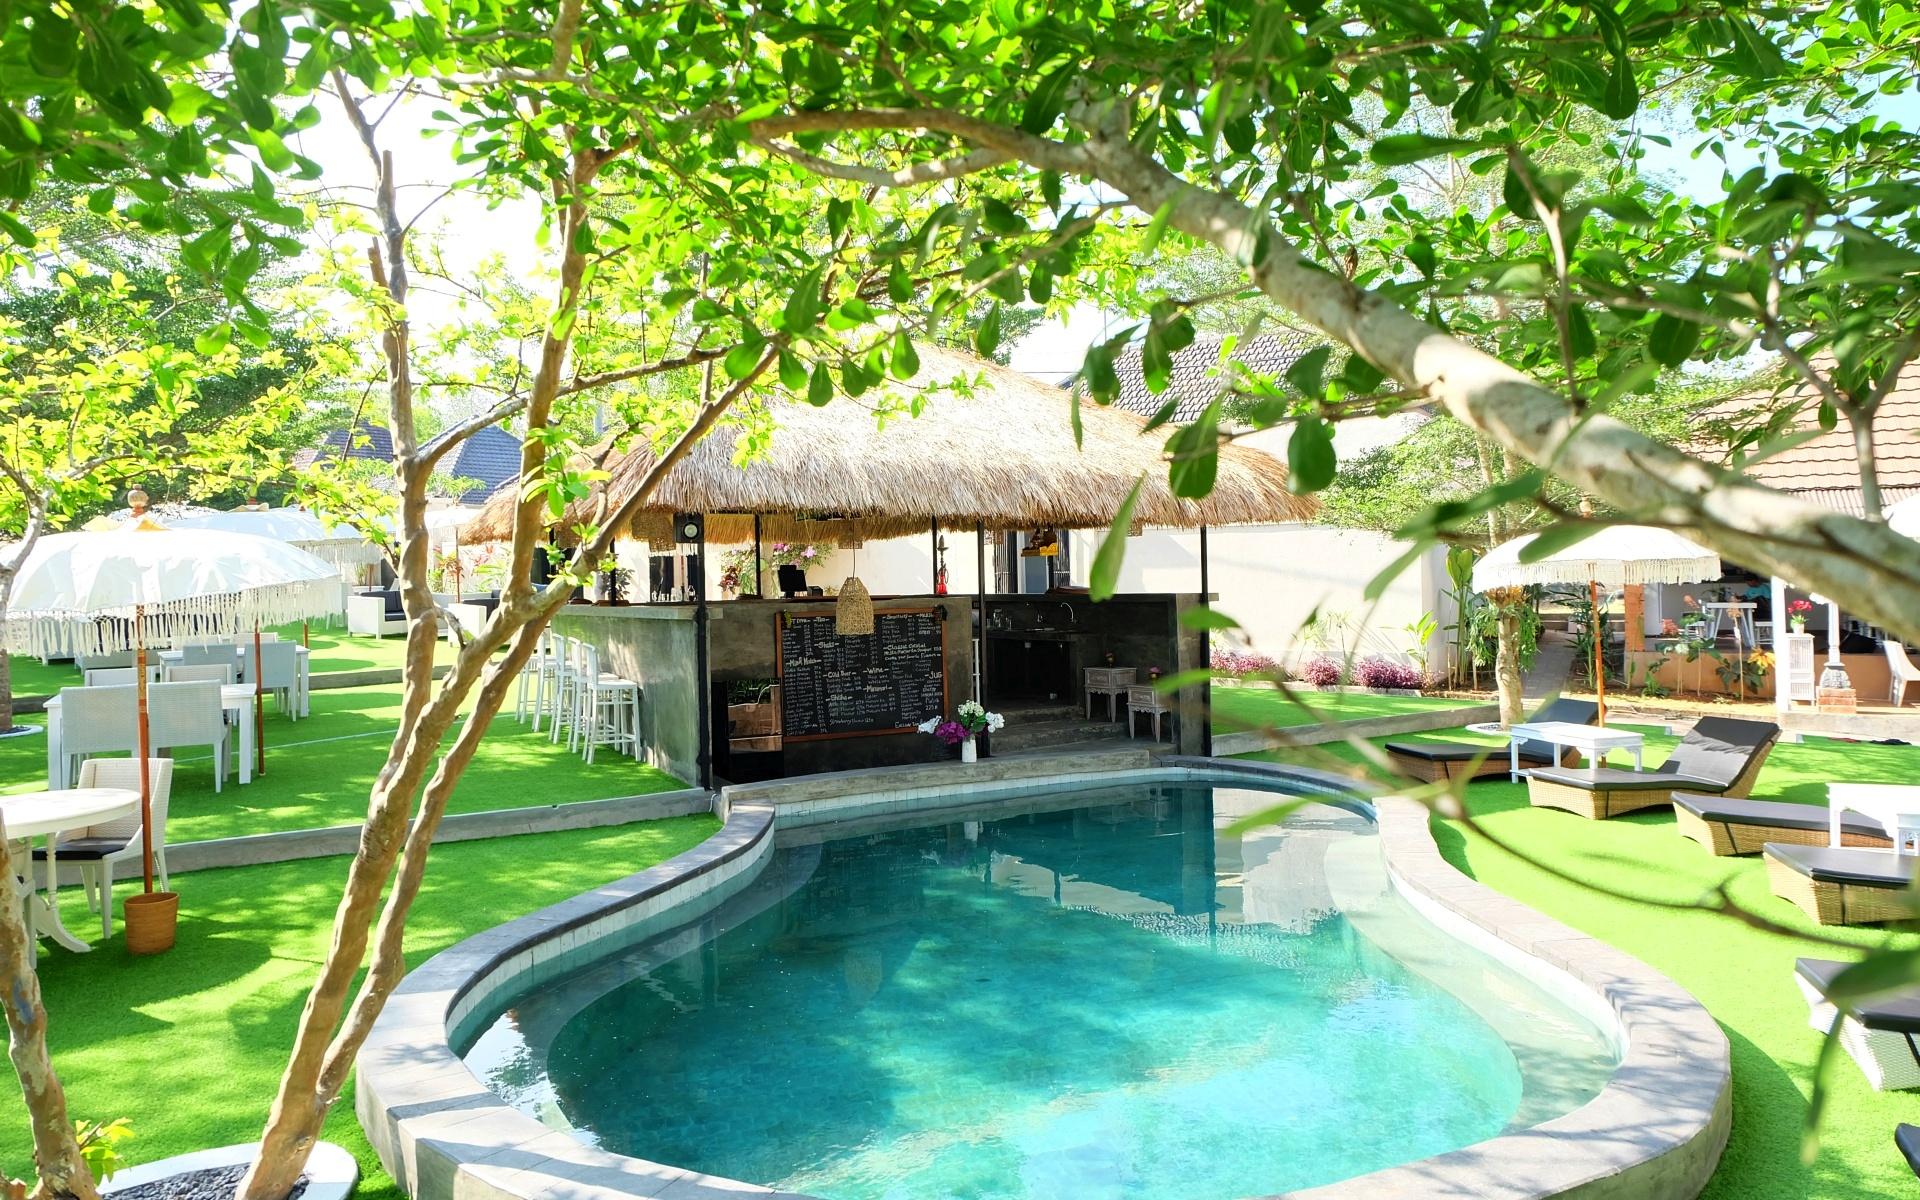 The Resort Bali